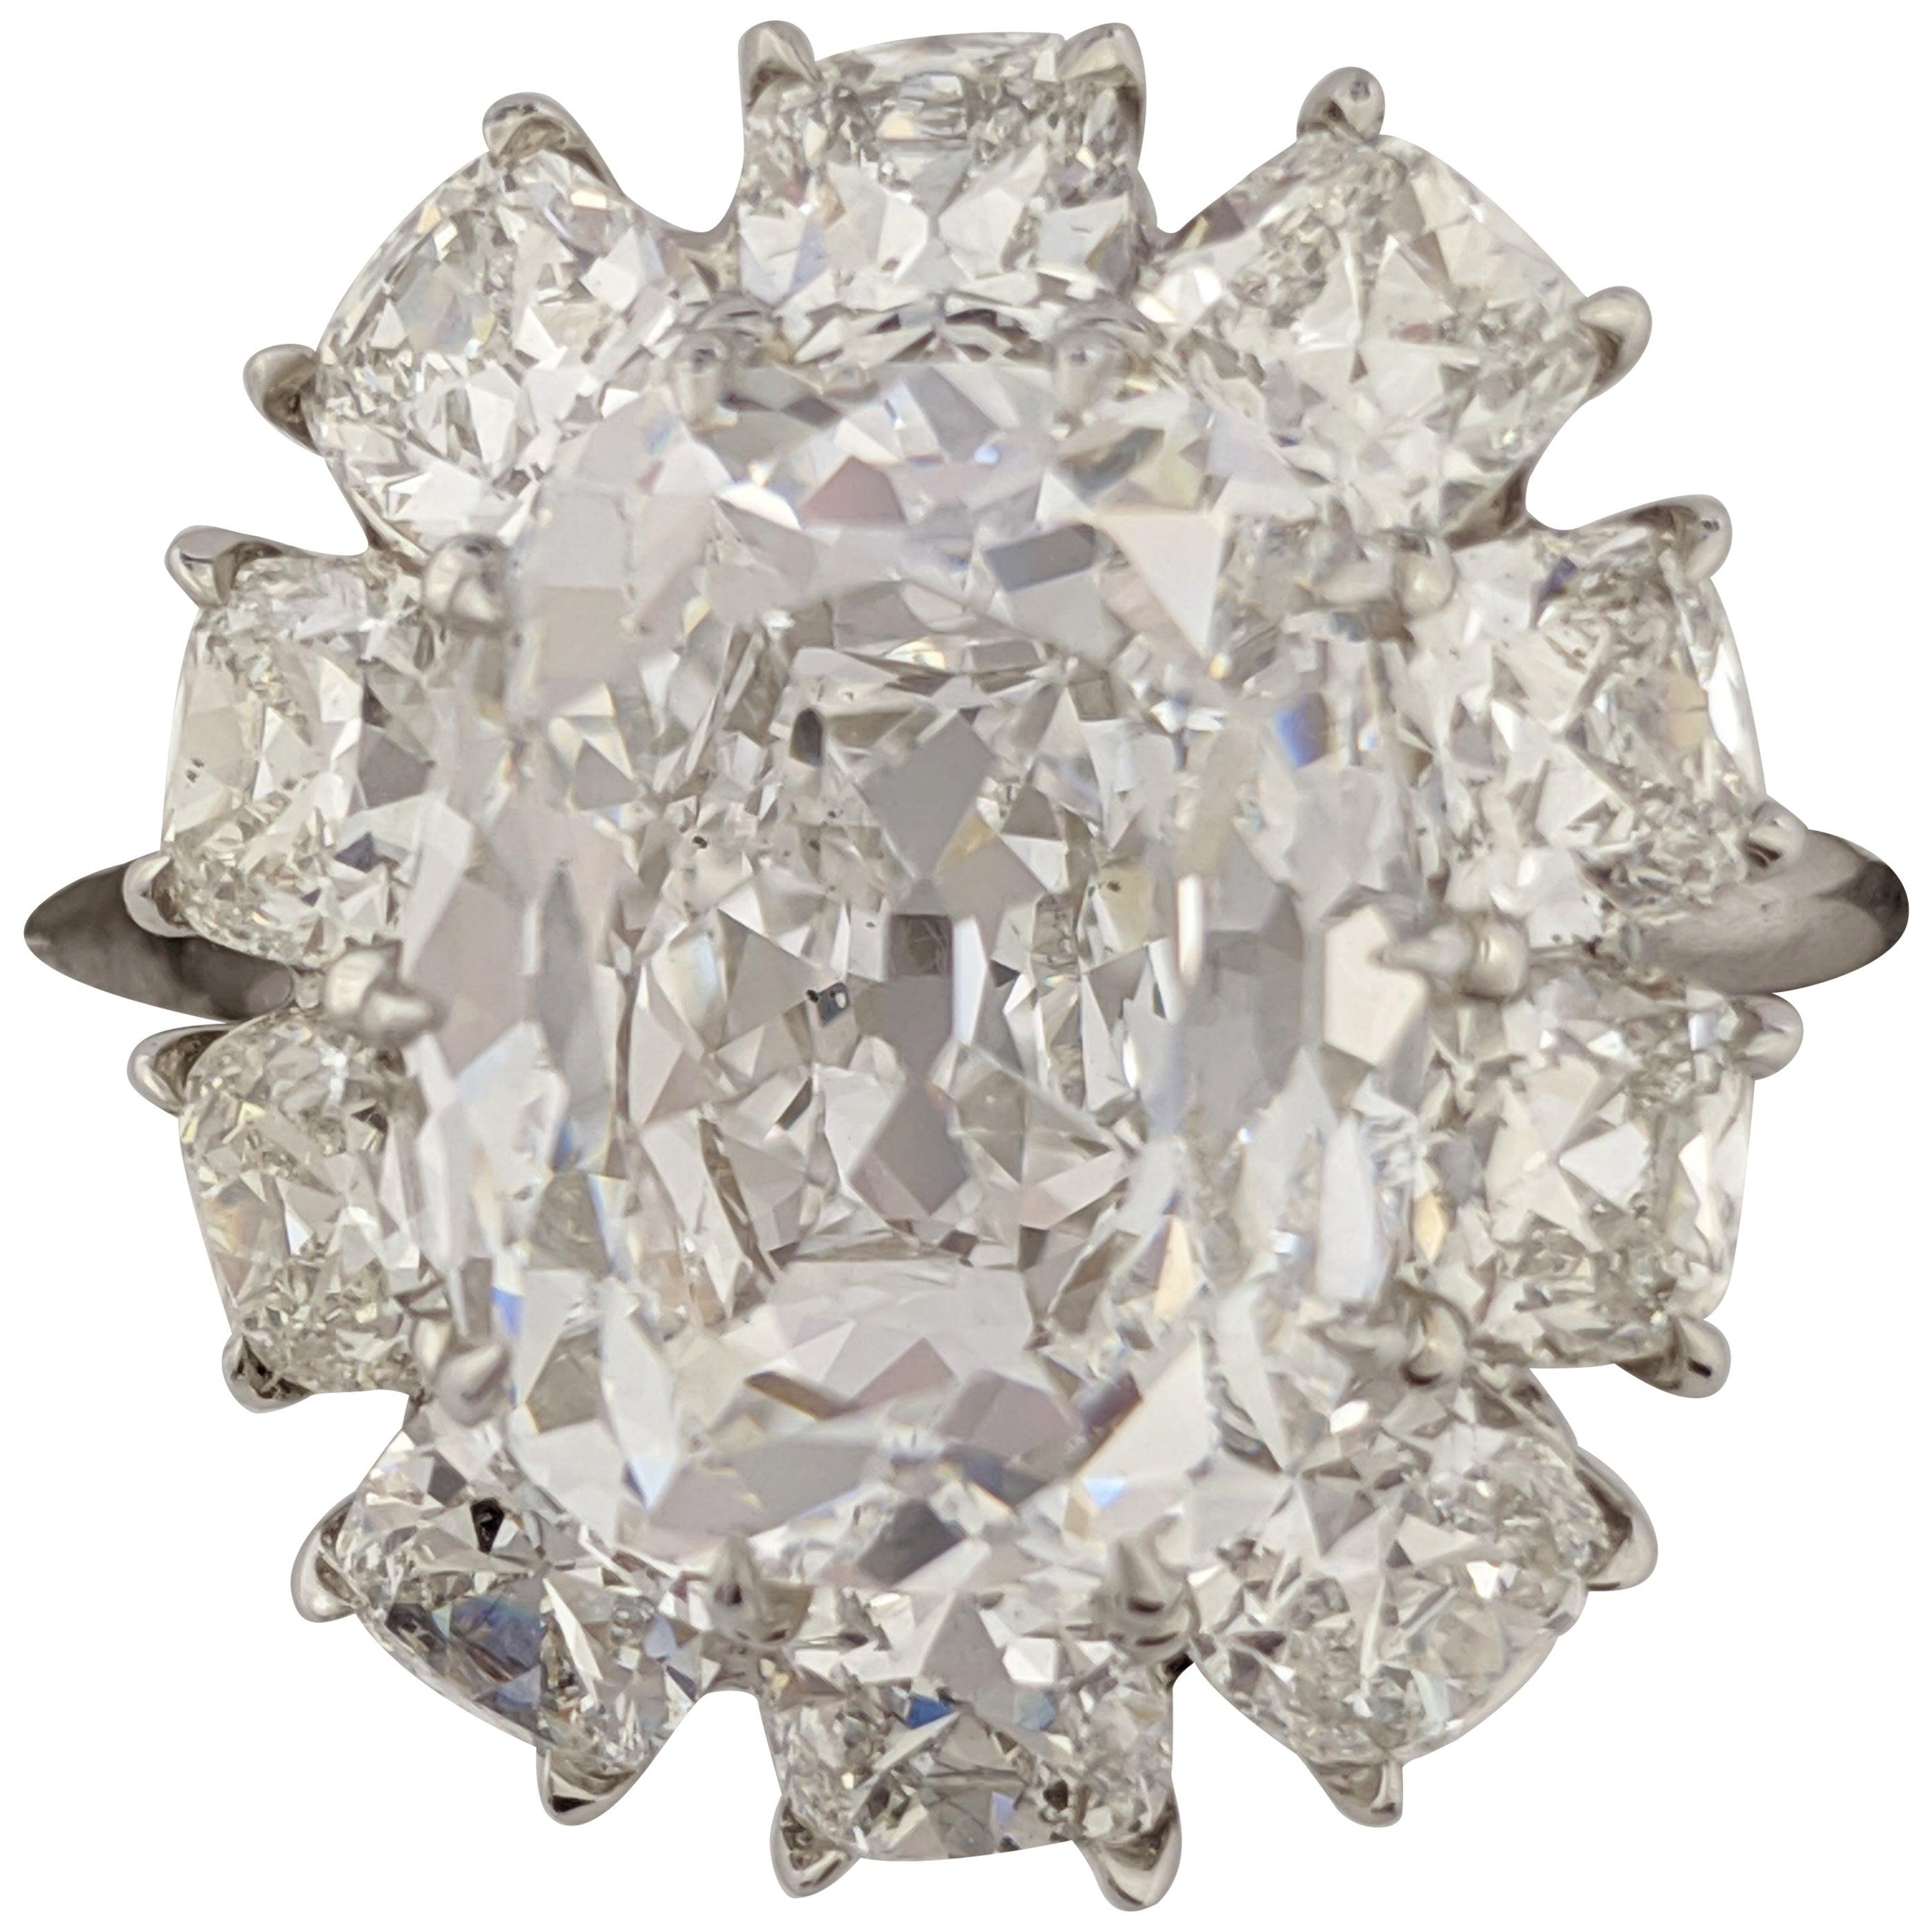 7 Carat Cushion Cut D VS1 Diamond Ring in Platinum, GIA